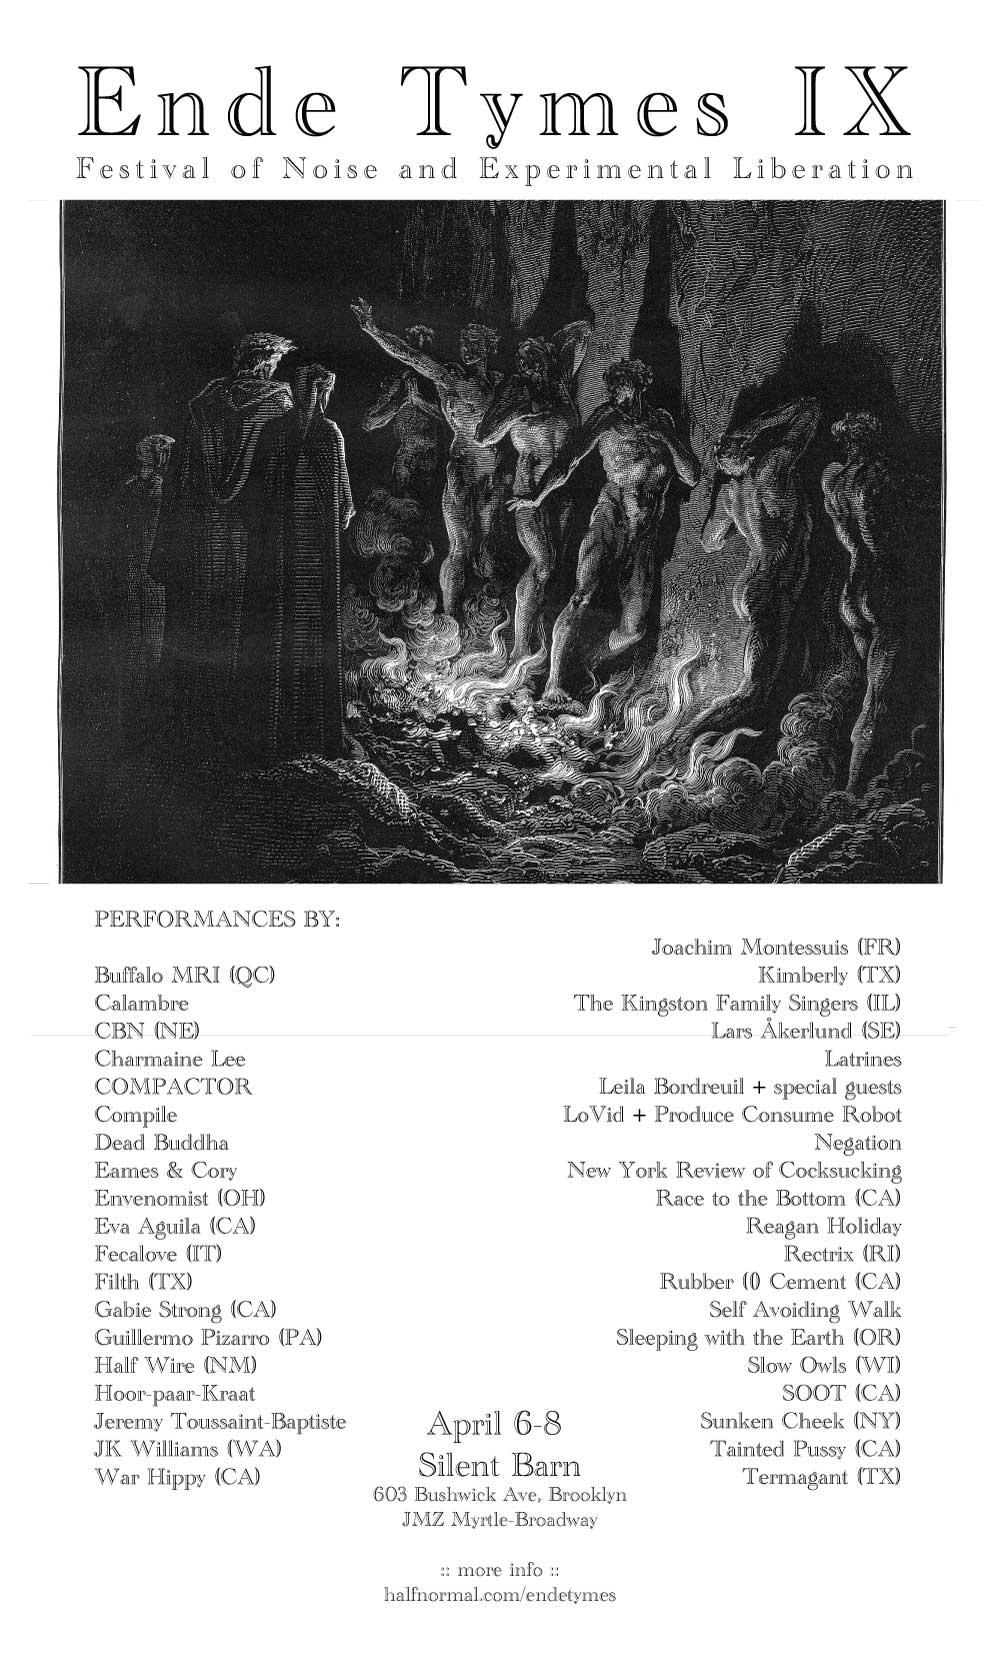 Ende-Tymes-9-poster.jpg